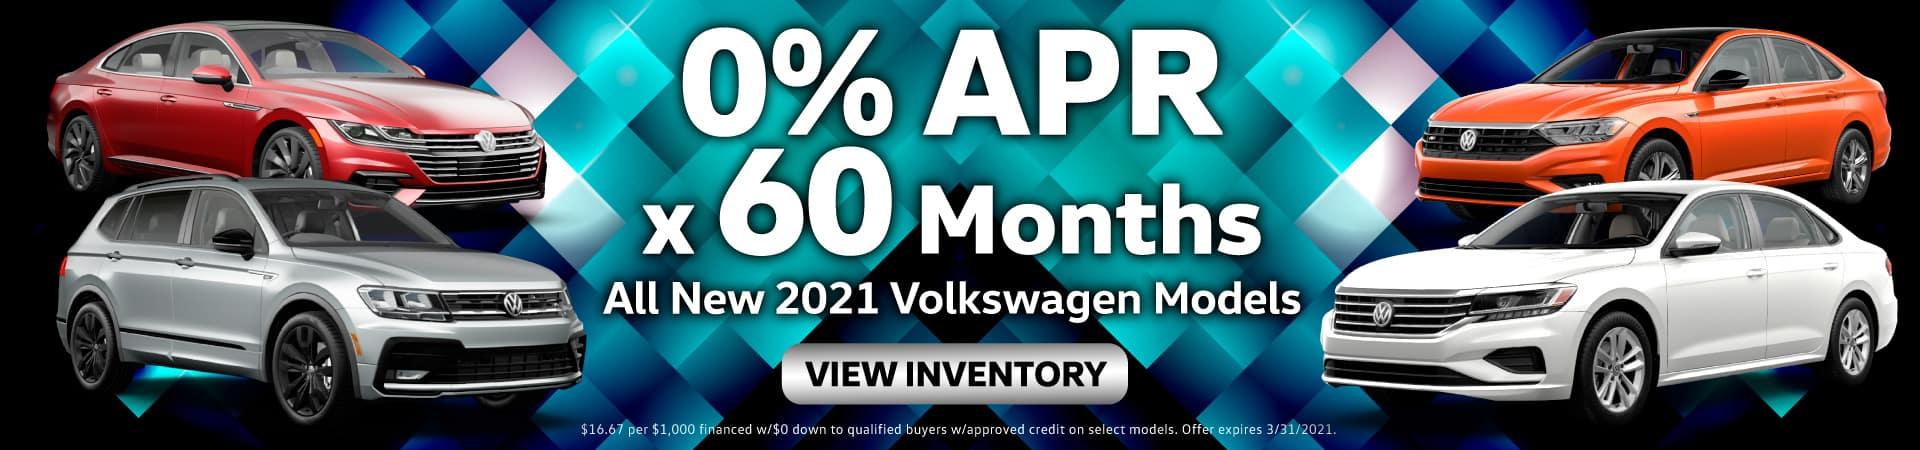 68465-FVVW_March_1920x450_0%x60